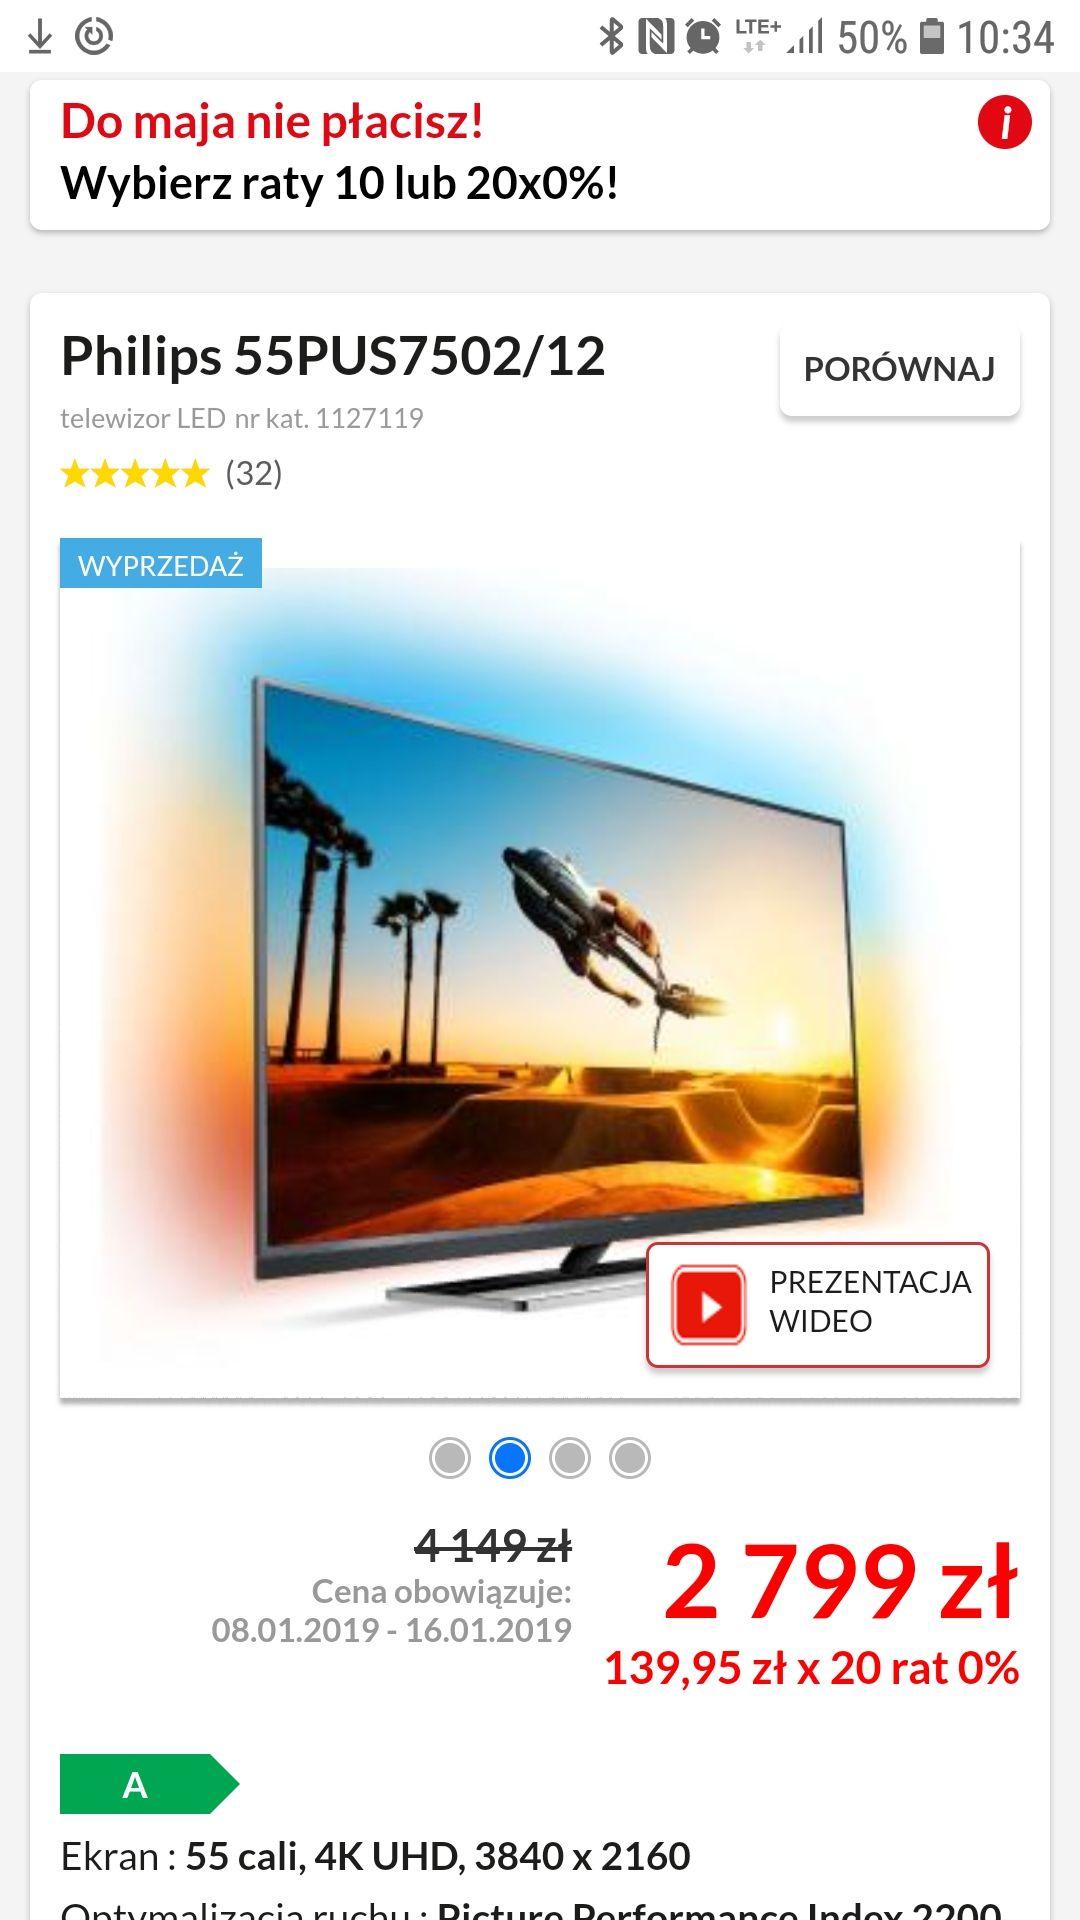 Philips 55PUS7502 RTVeuroAGD 20x0%